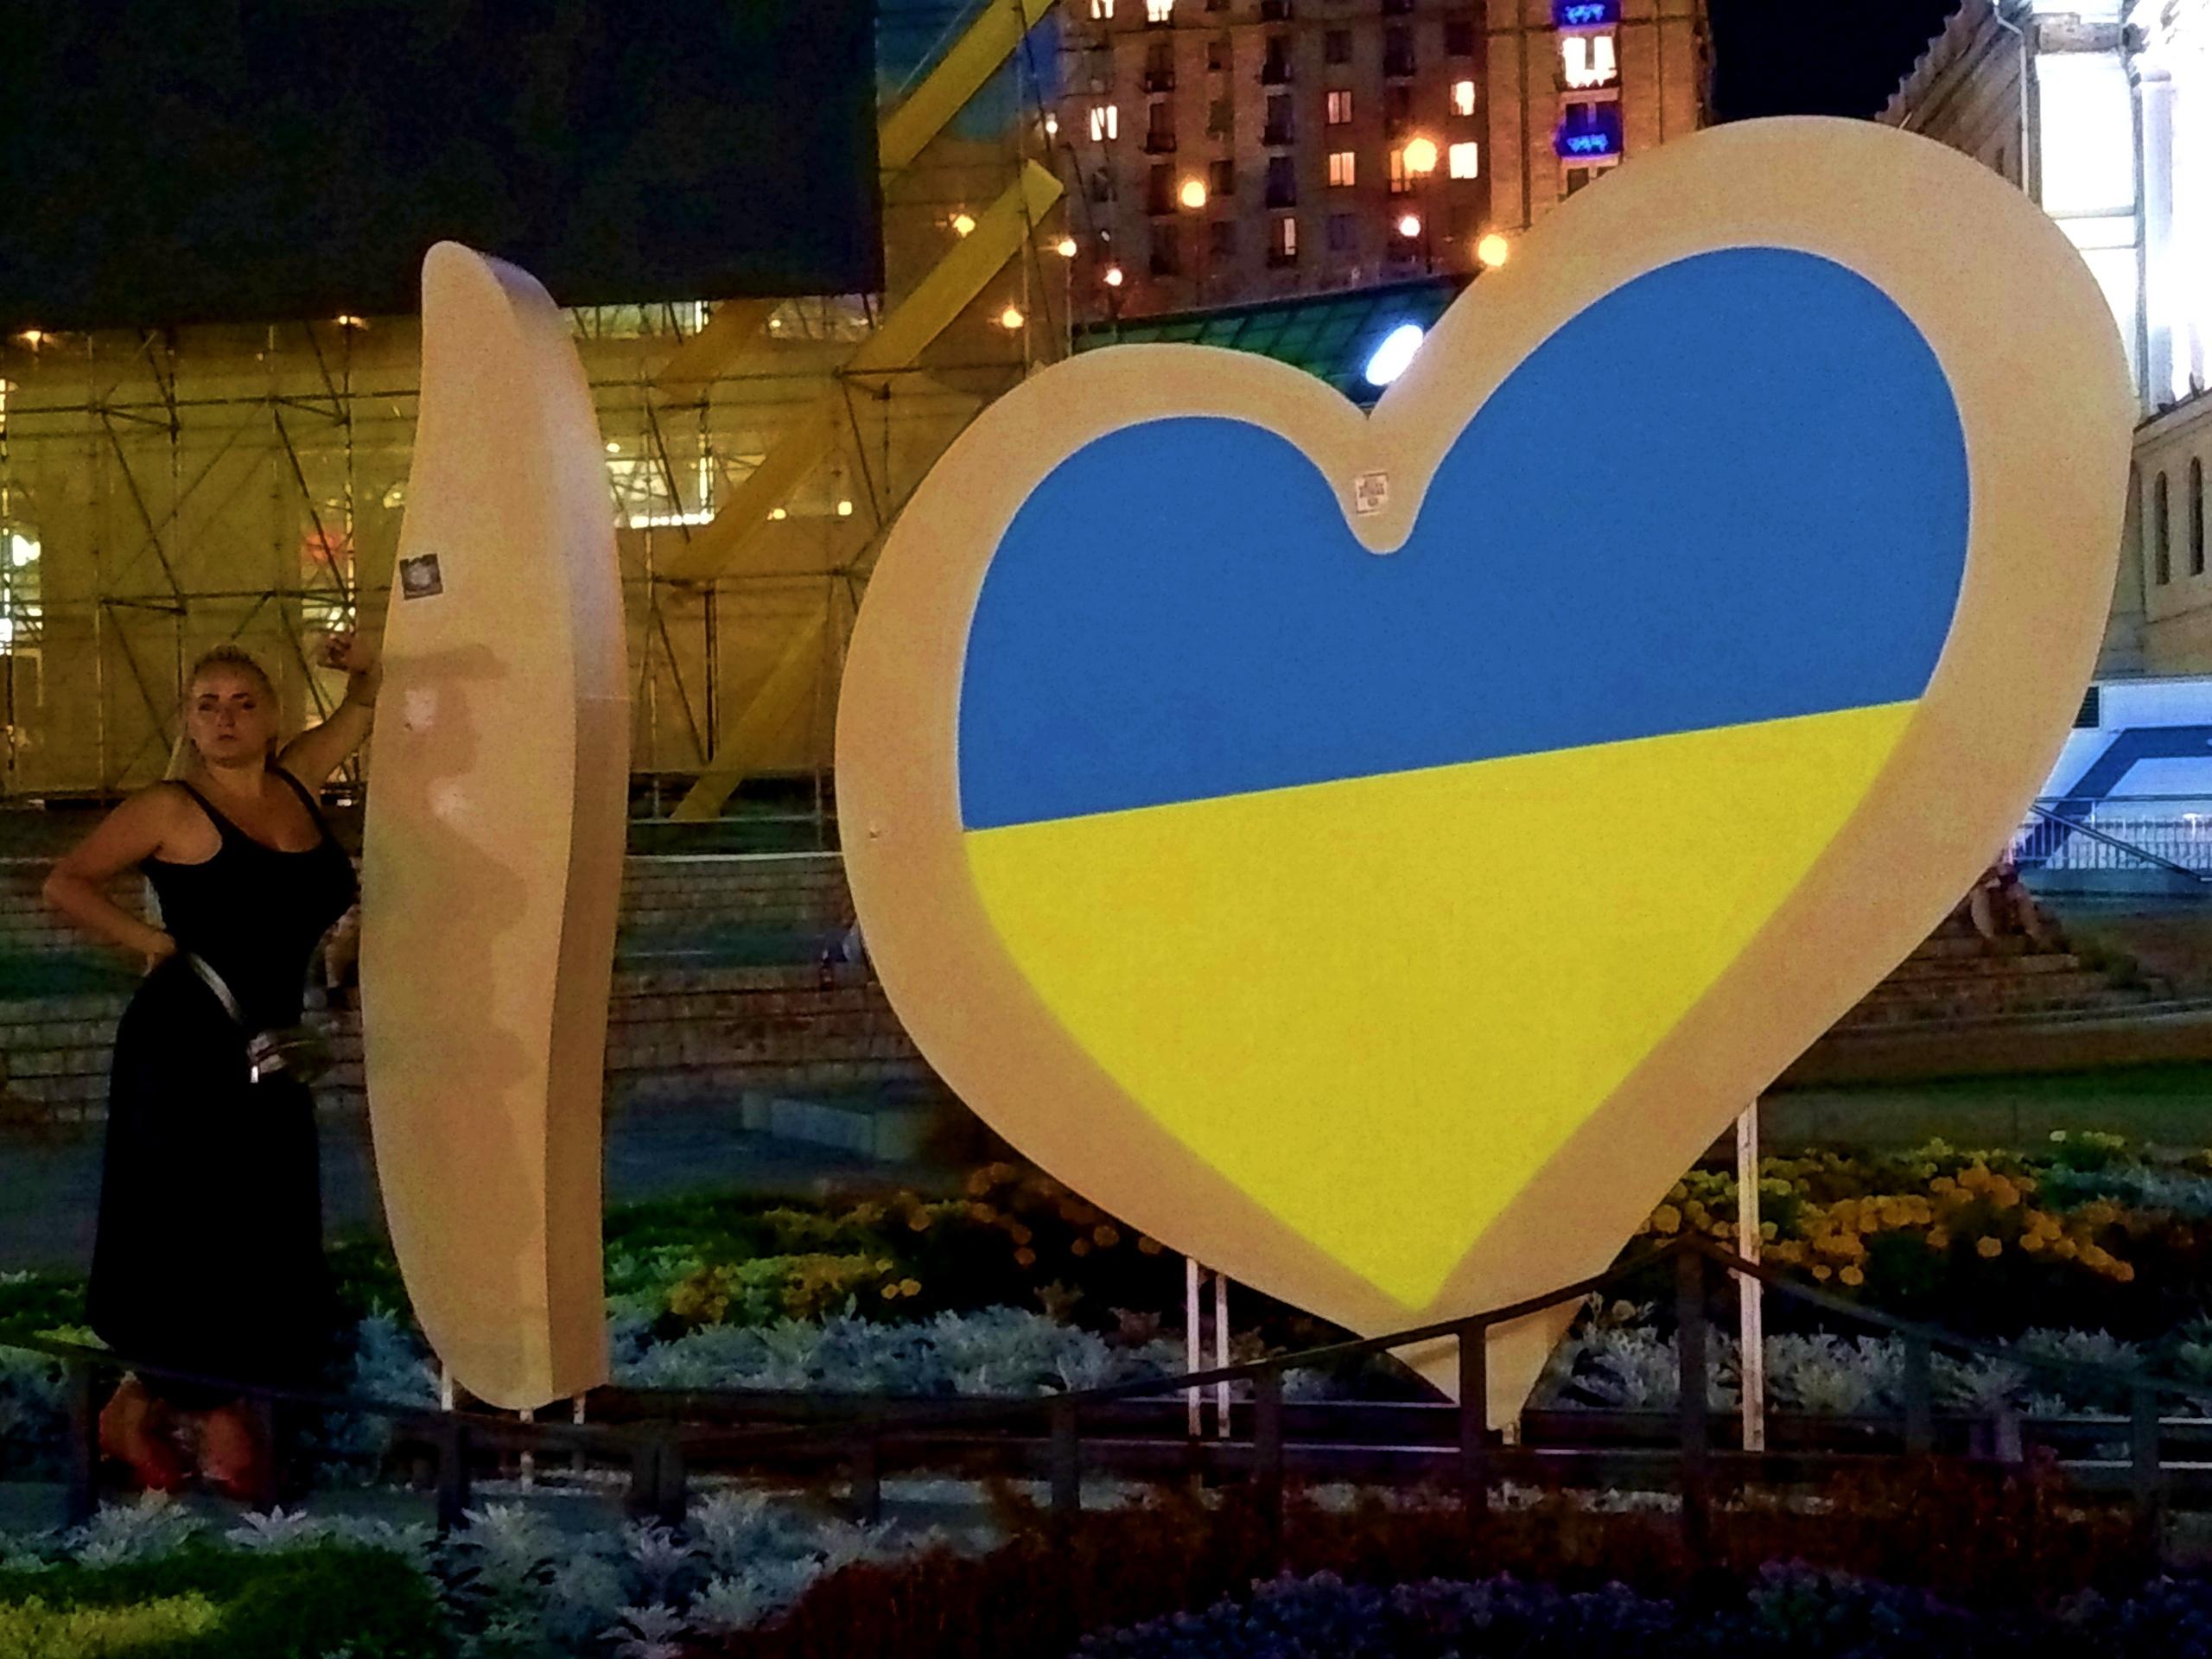 Елена Руденко (Валтея). Украина. Киев. Фото и описание.  - Страница 2 VZuByx33Si8